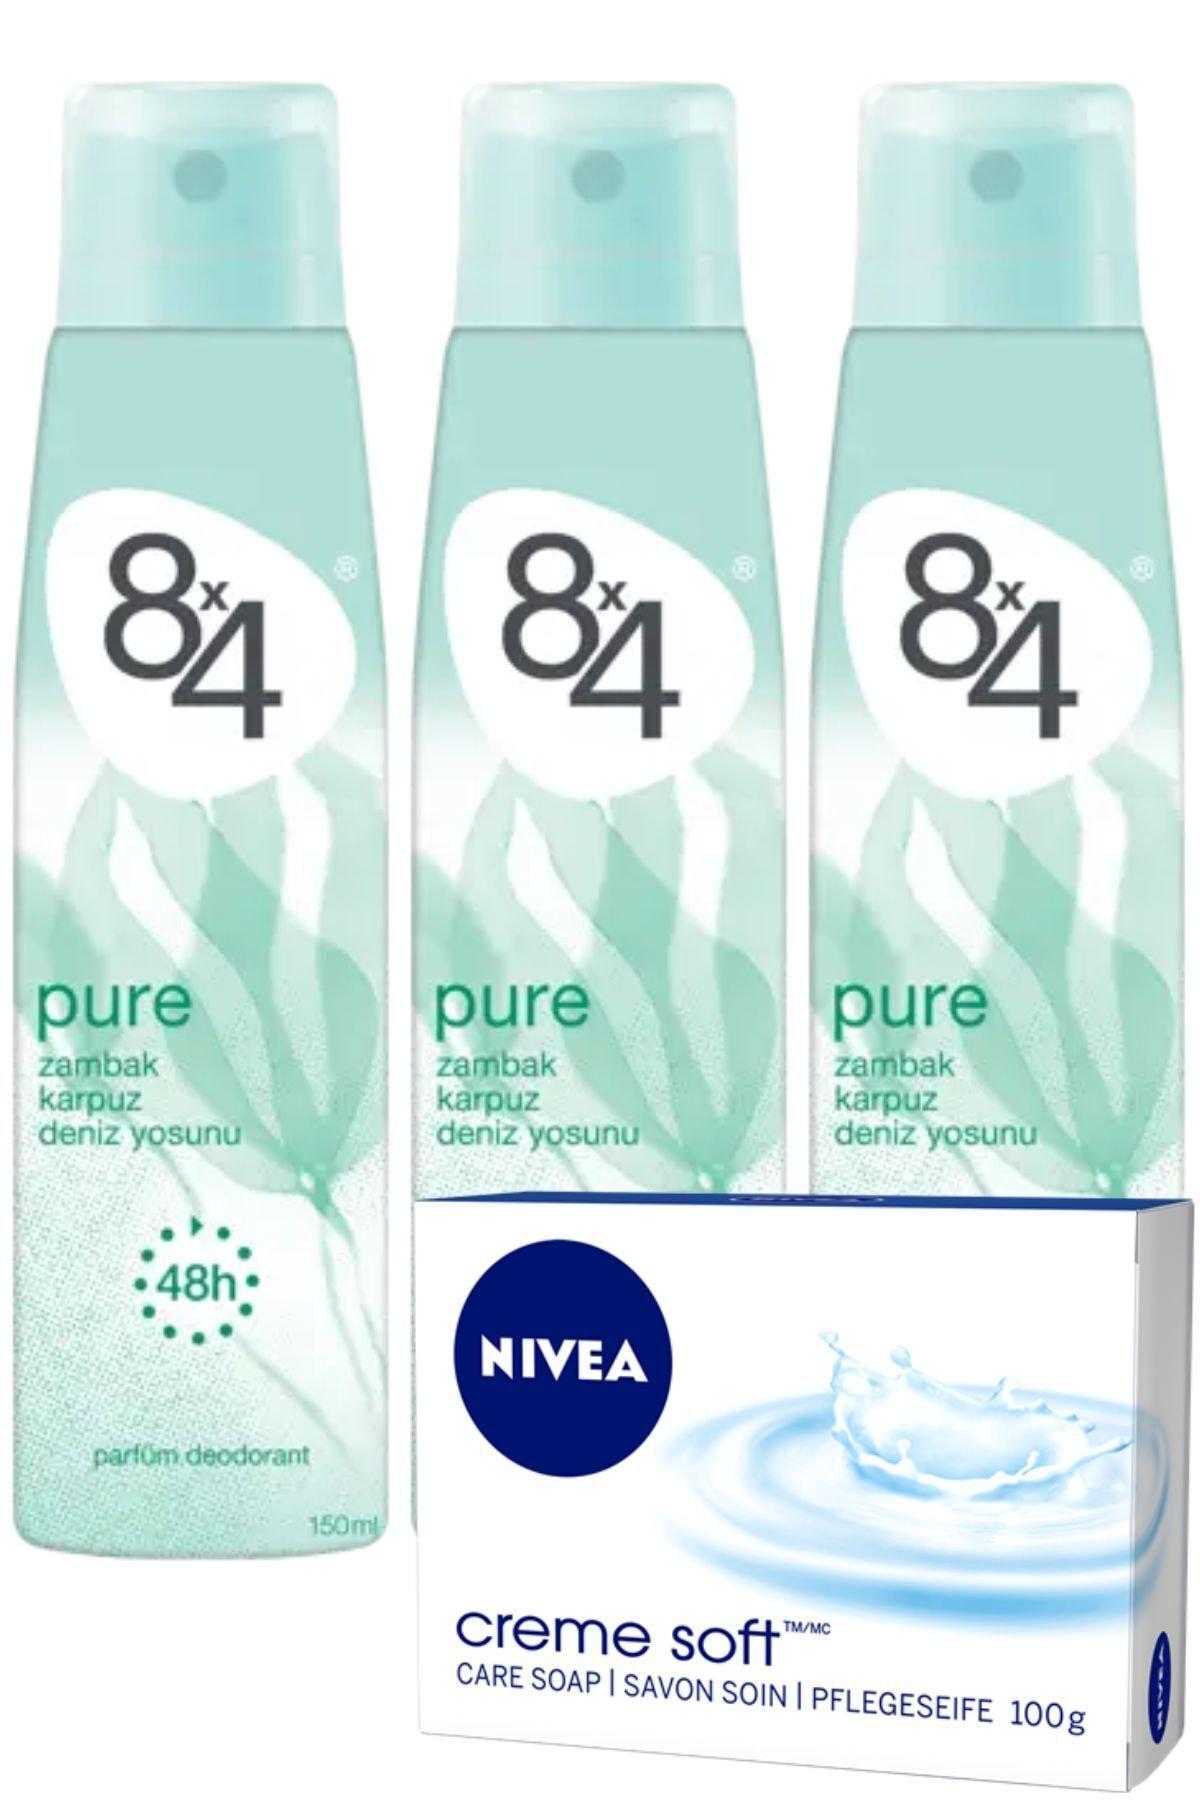 8x4 Pure Pudrasız Unisex Deodorant Sprey 150 ml X 3 Adet 1